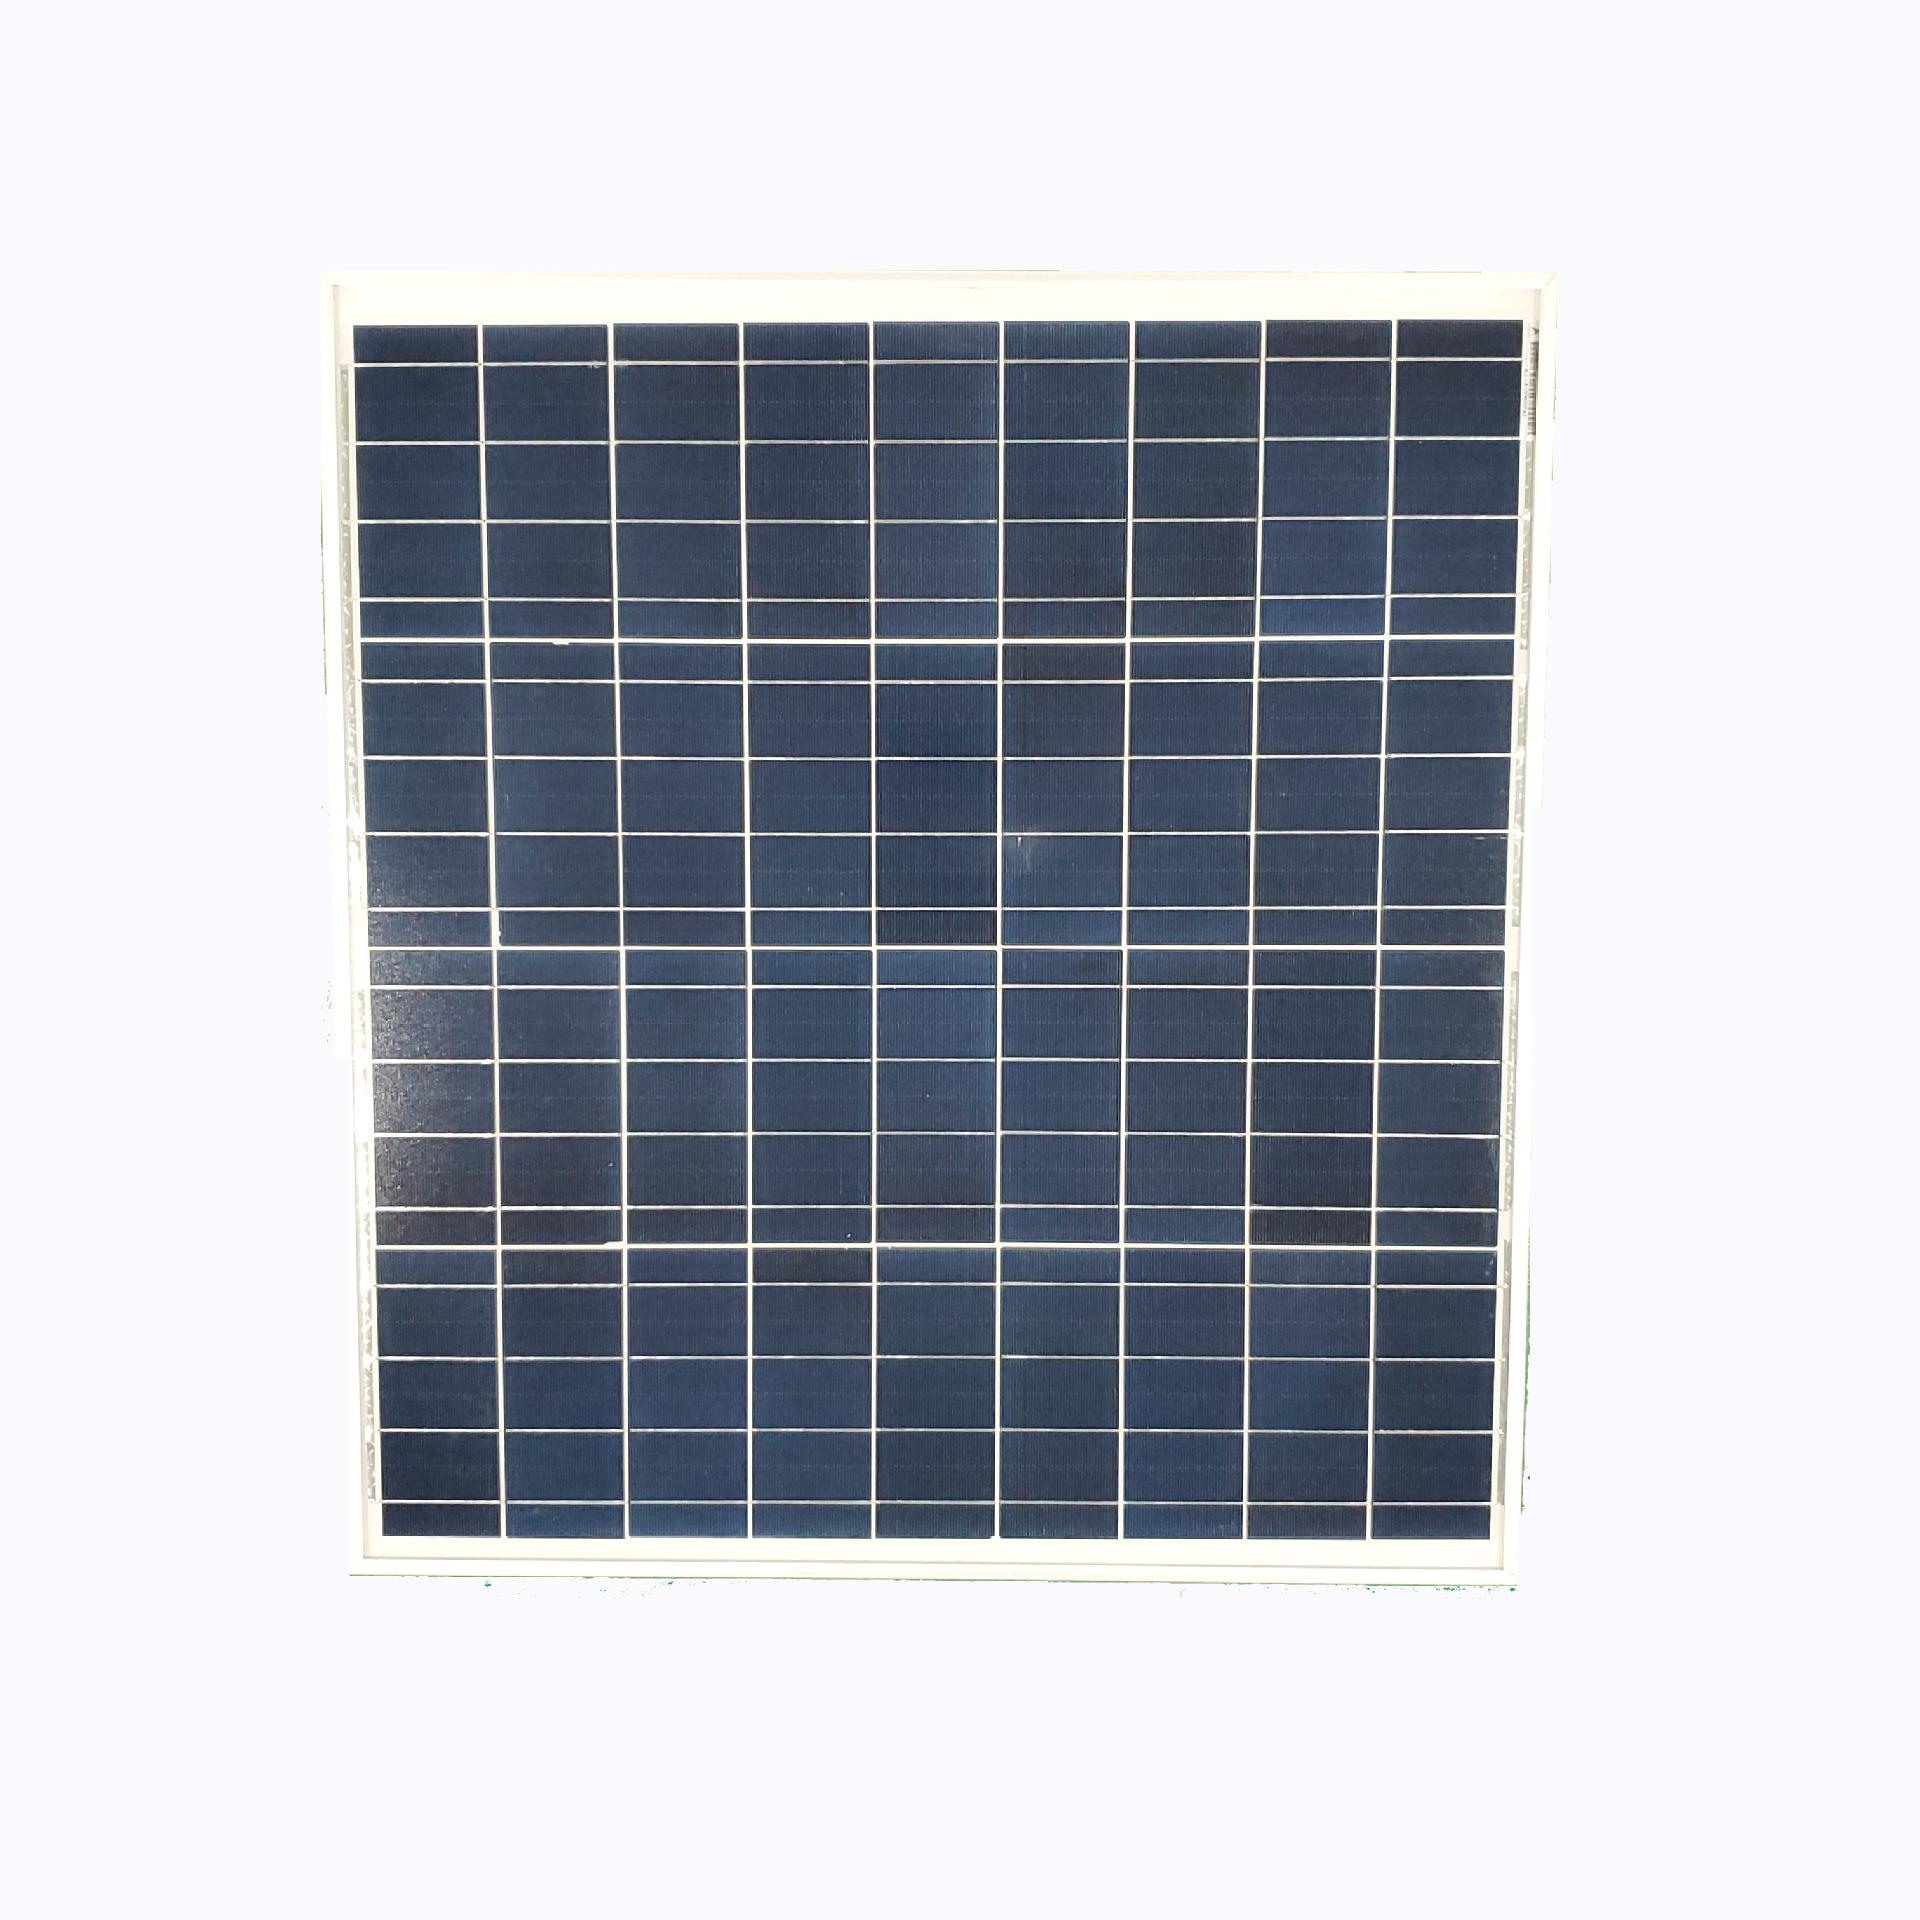 生产定制太阳能电池板 多晶 单晶 6V 18v 12v 30v 36v 非标定制